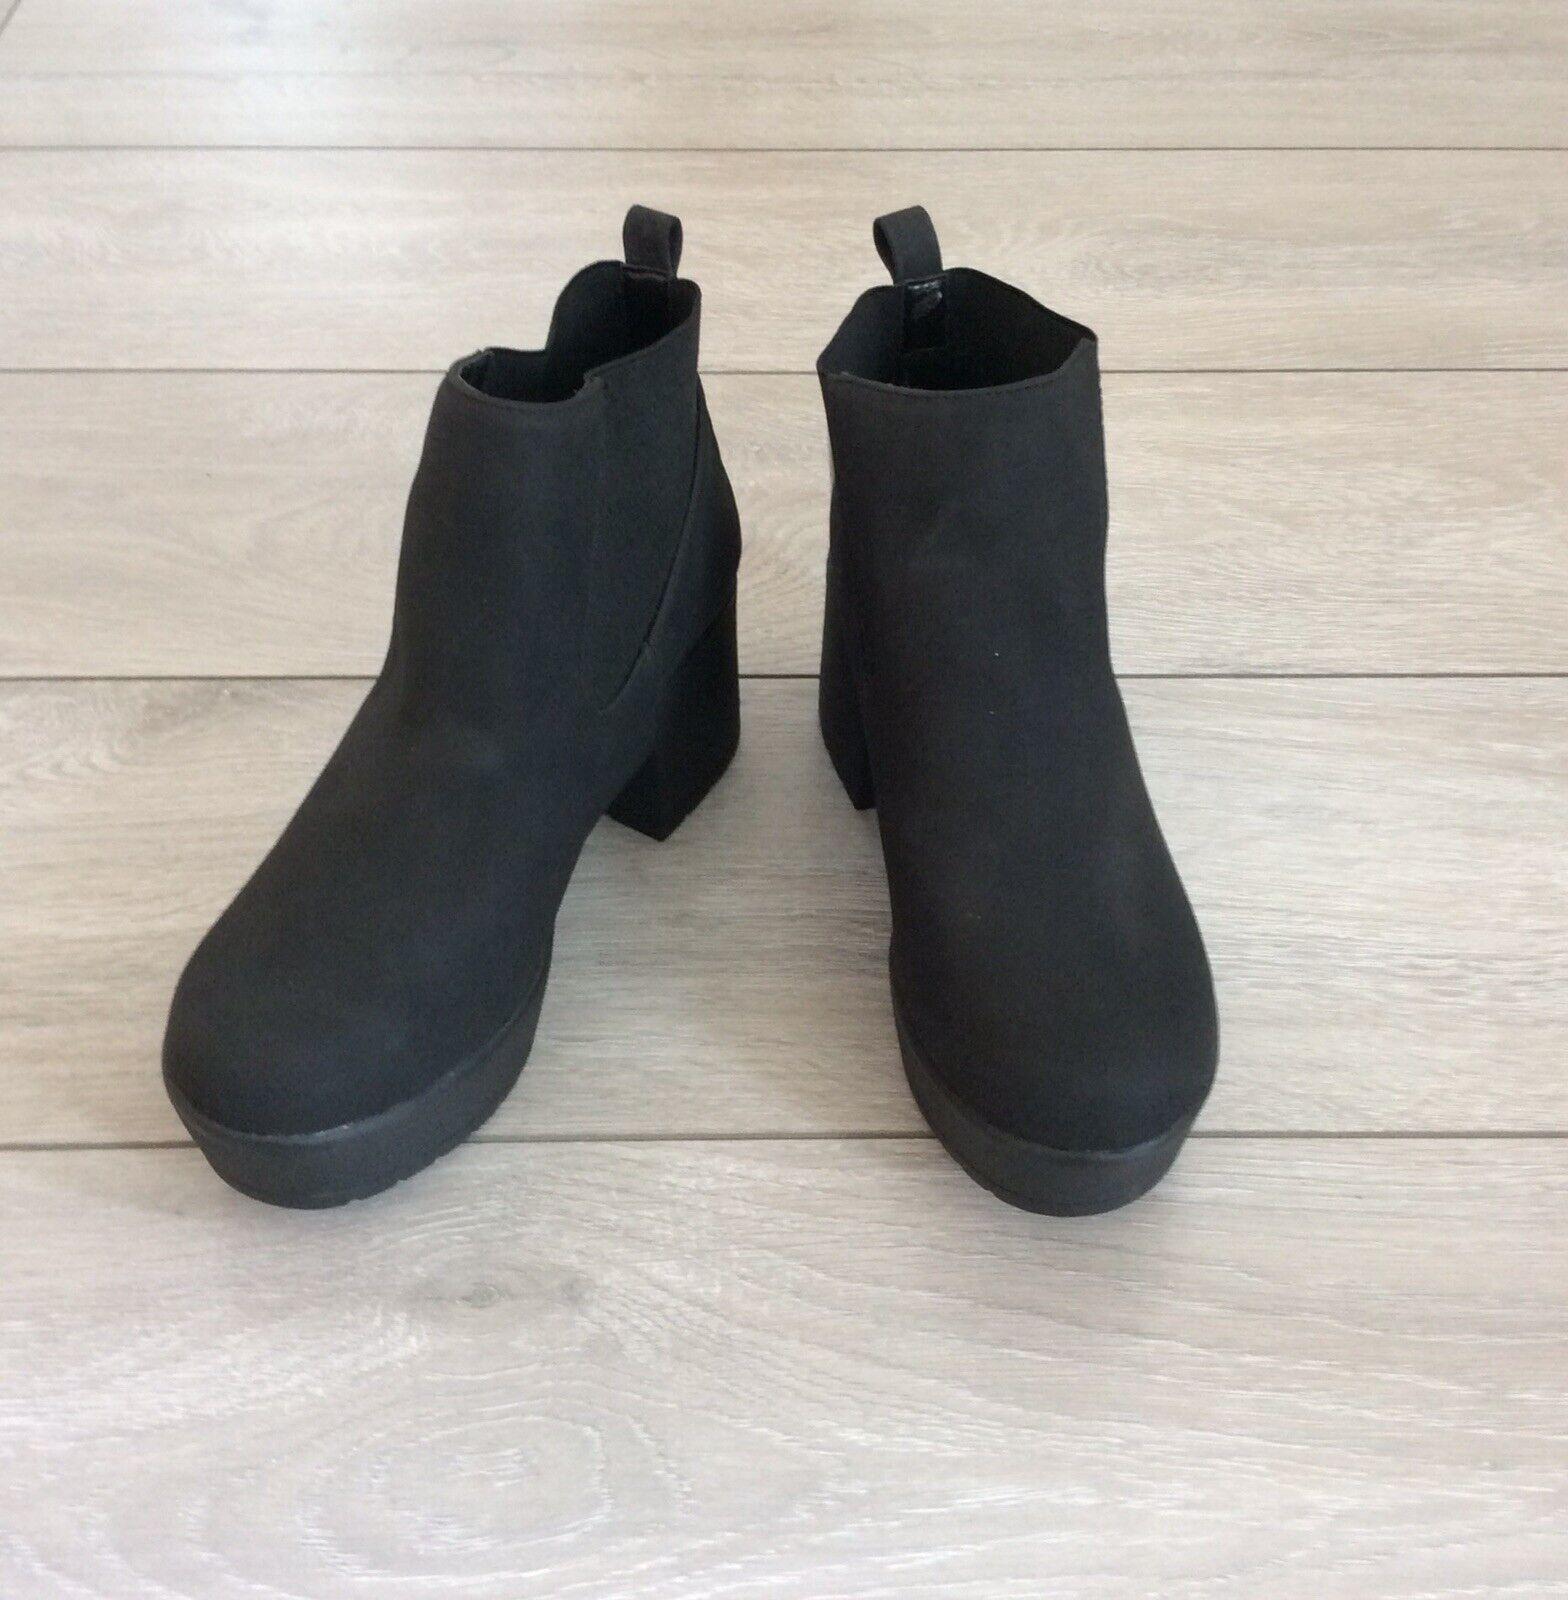 Asos noir daim synthétique taille basse à grosses Bottines, Taille UK 6